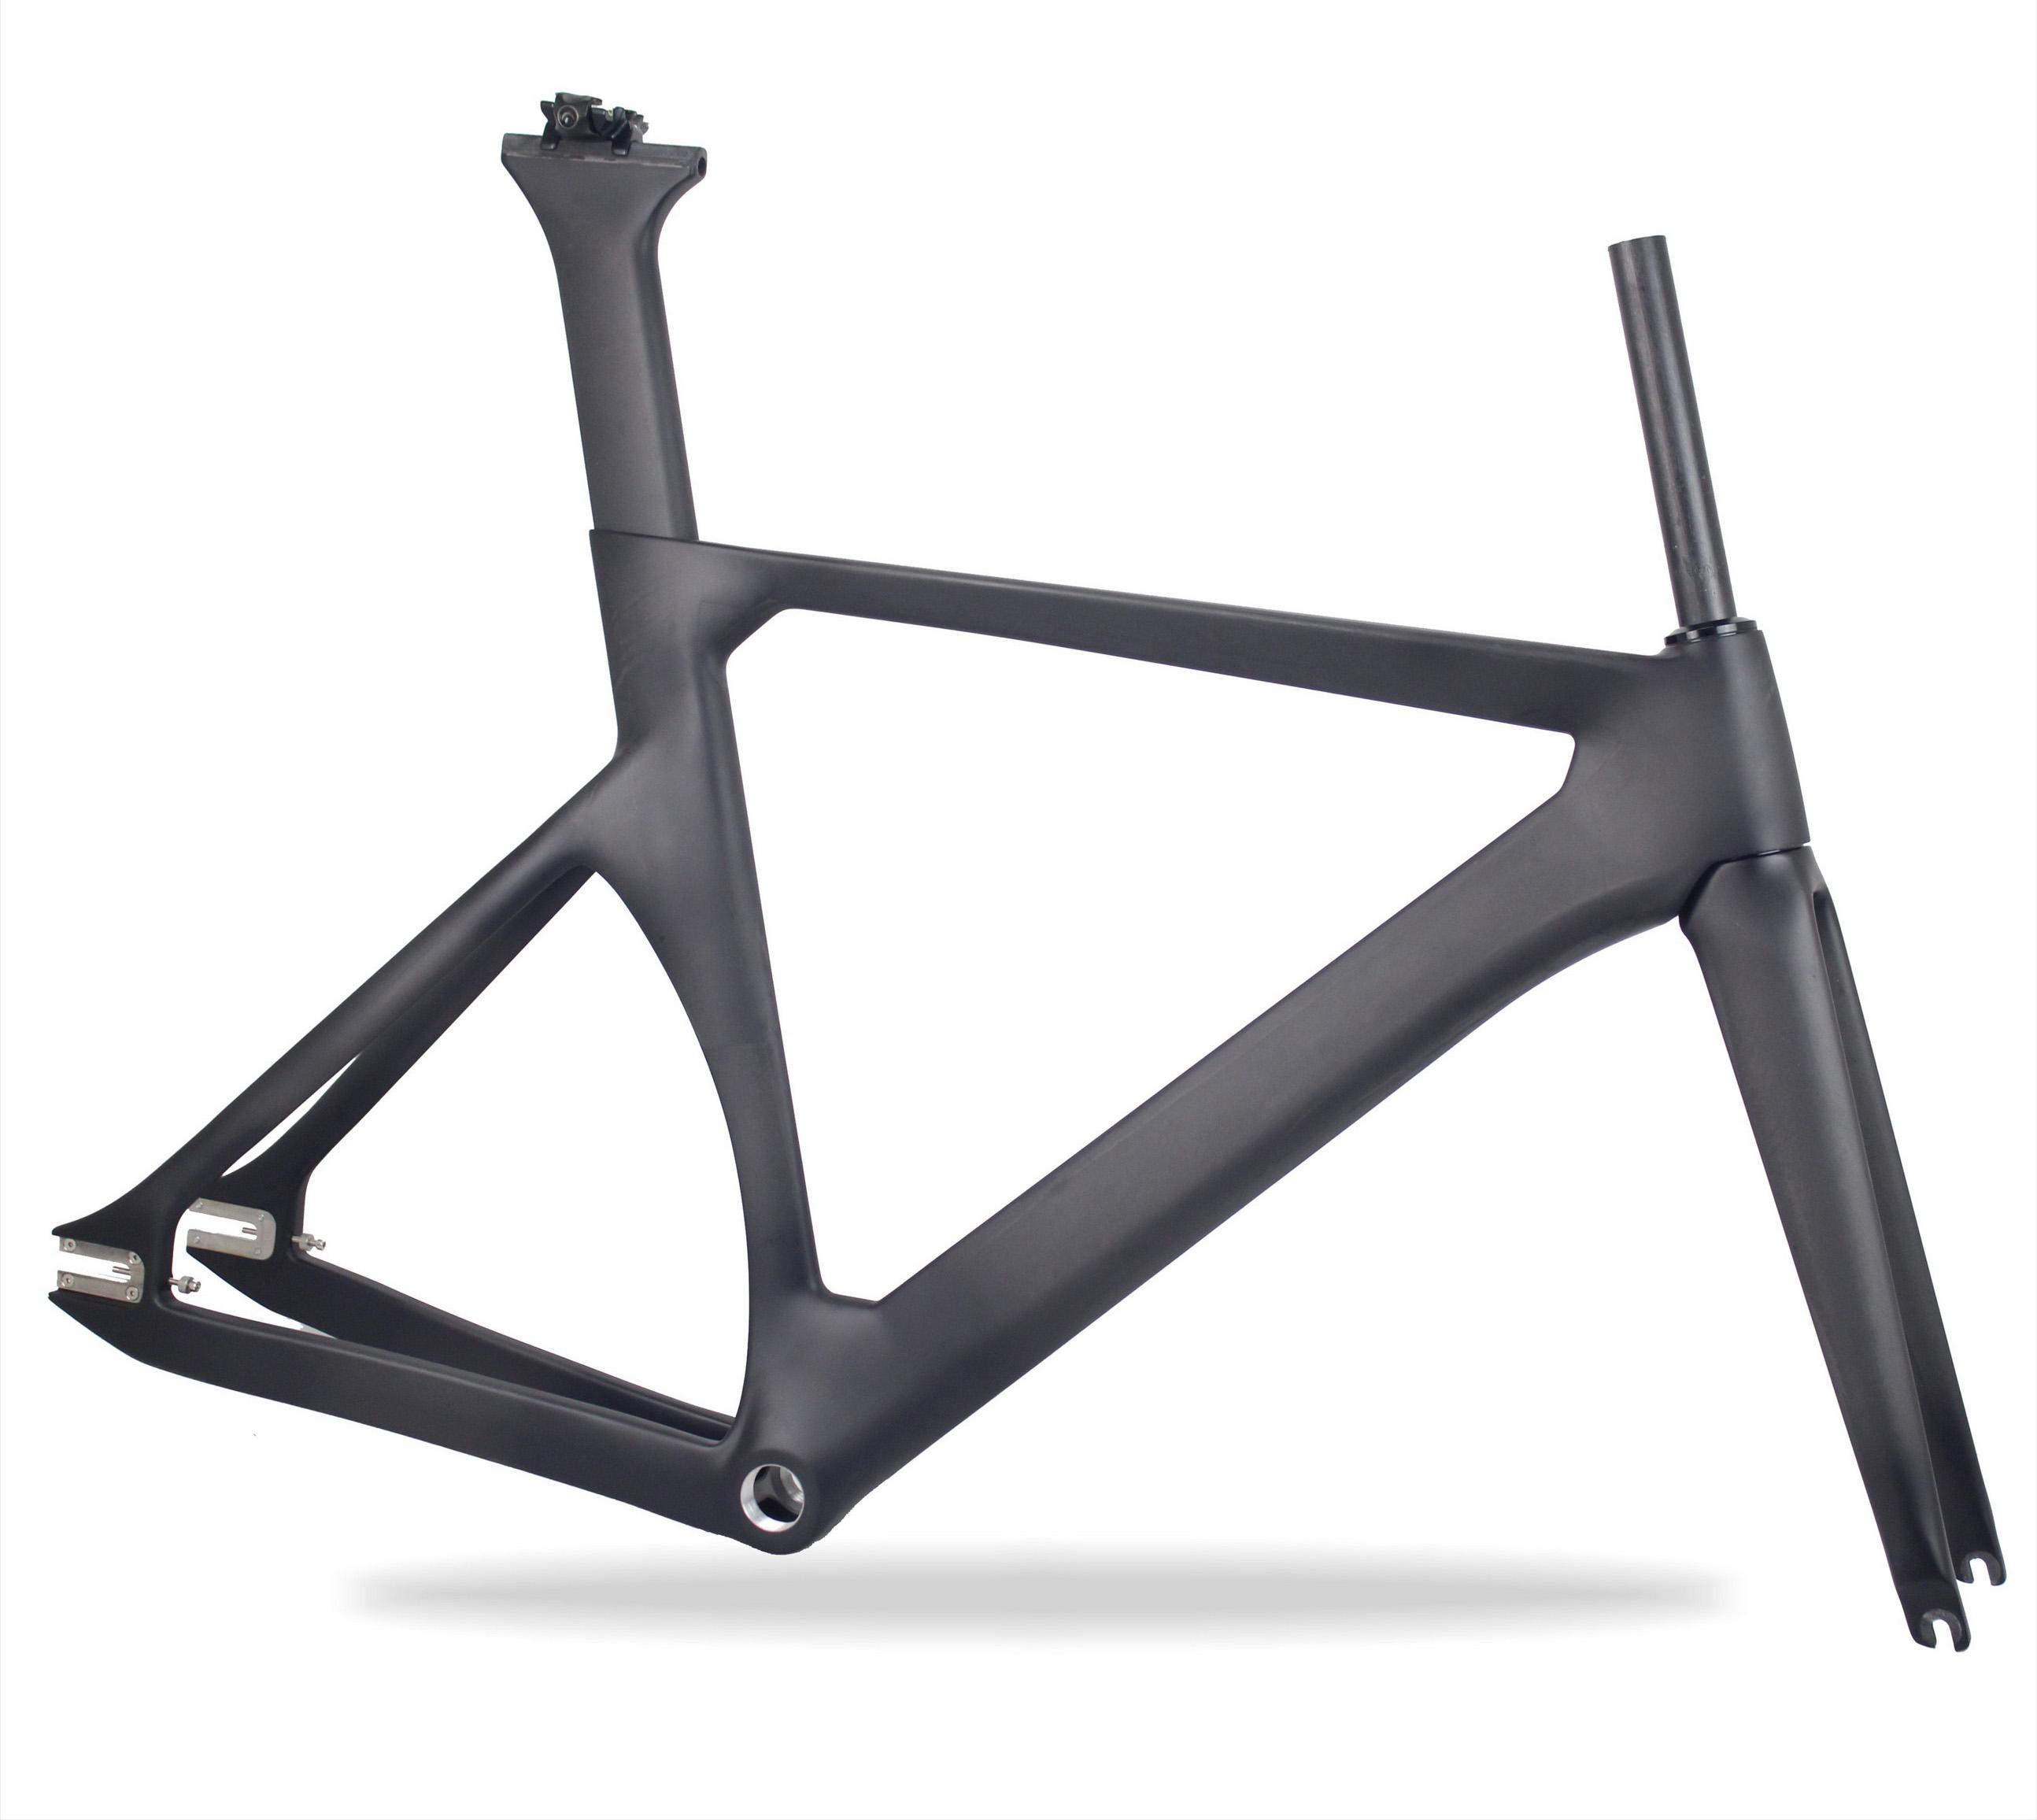 KELVIN Carbon ramme Aero pro